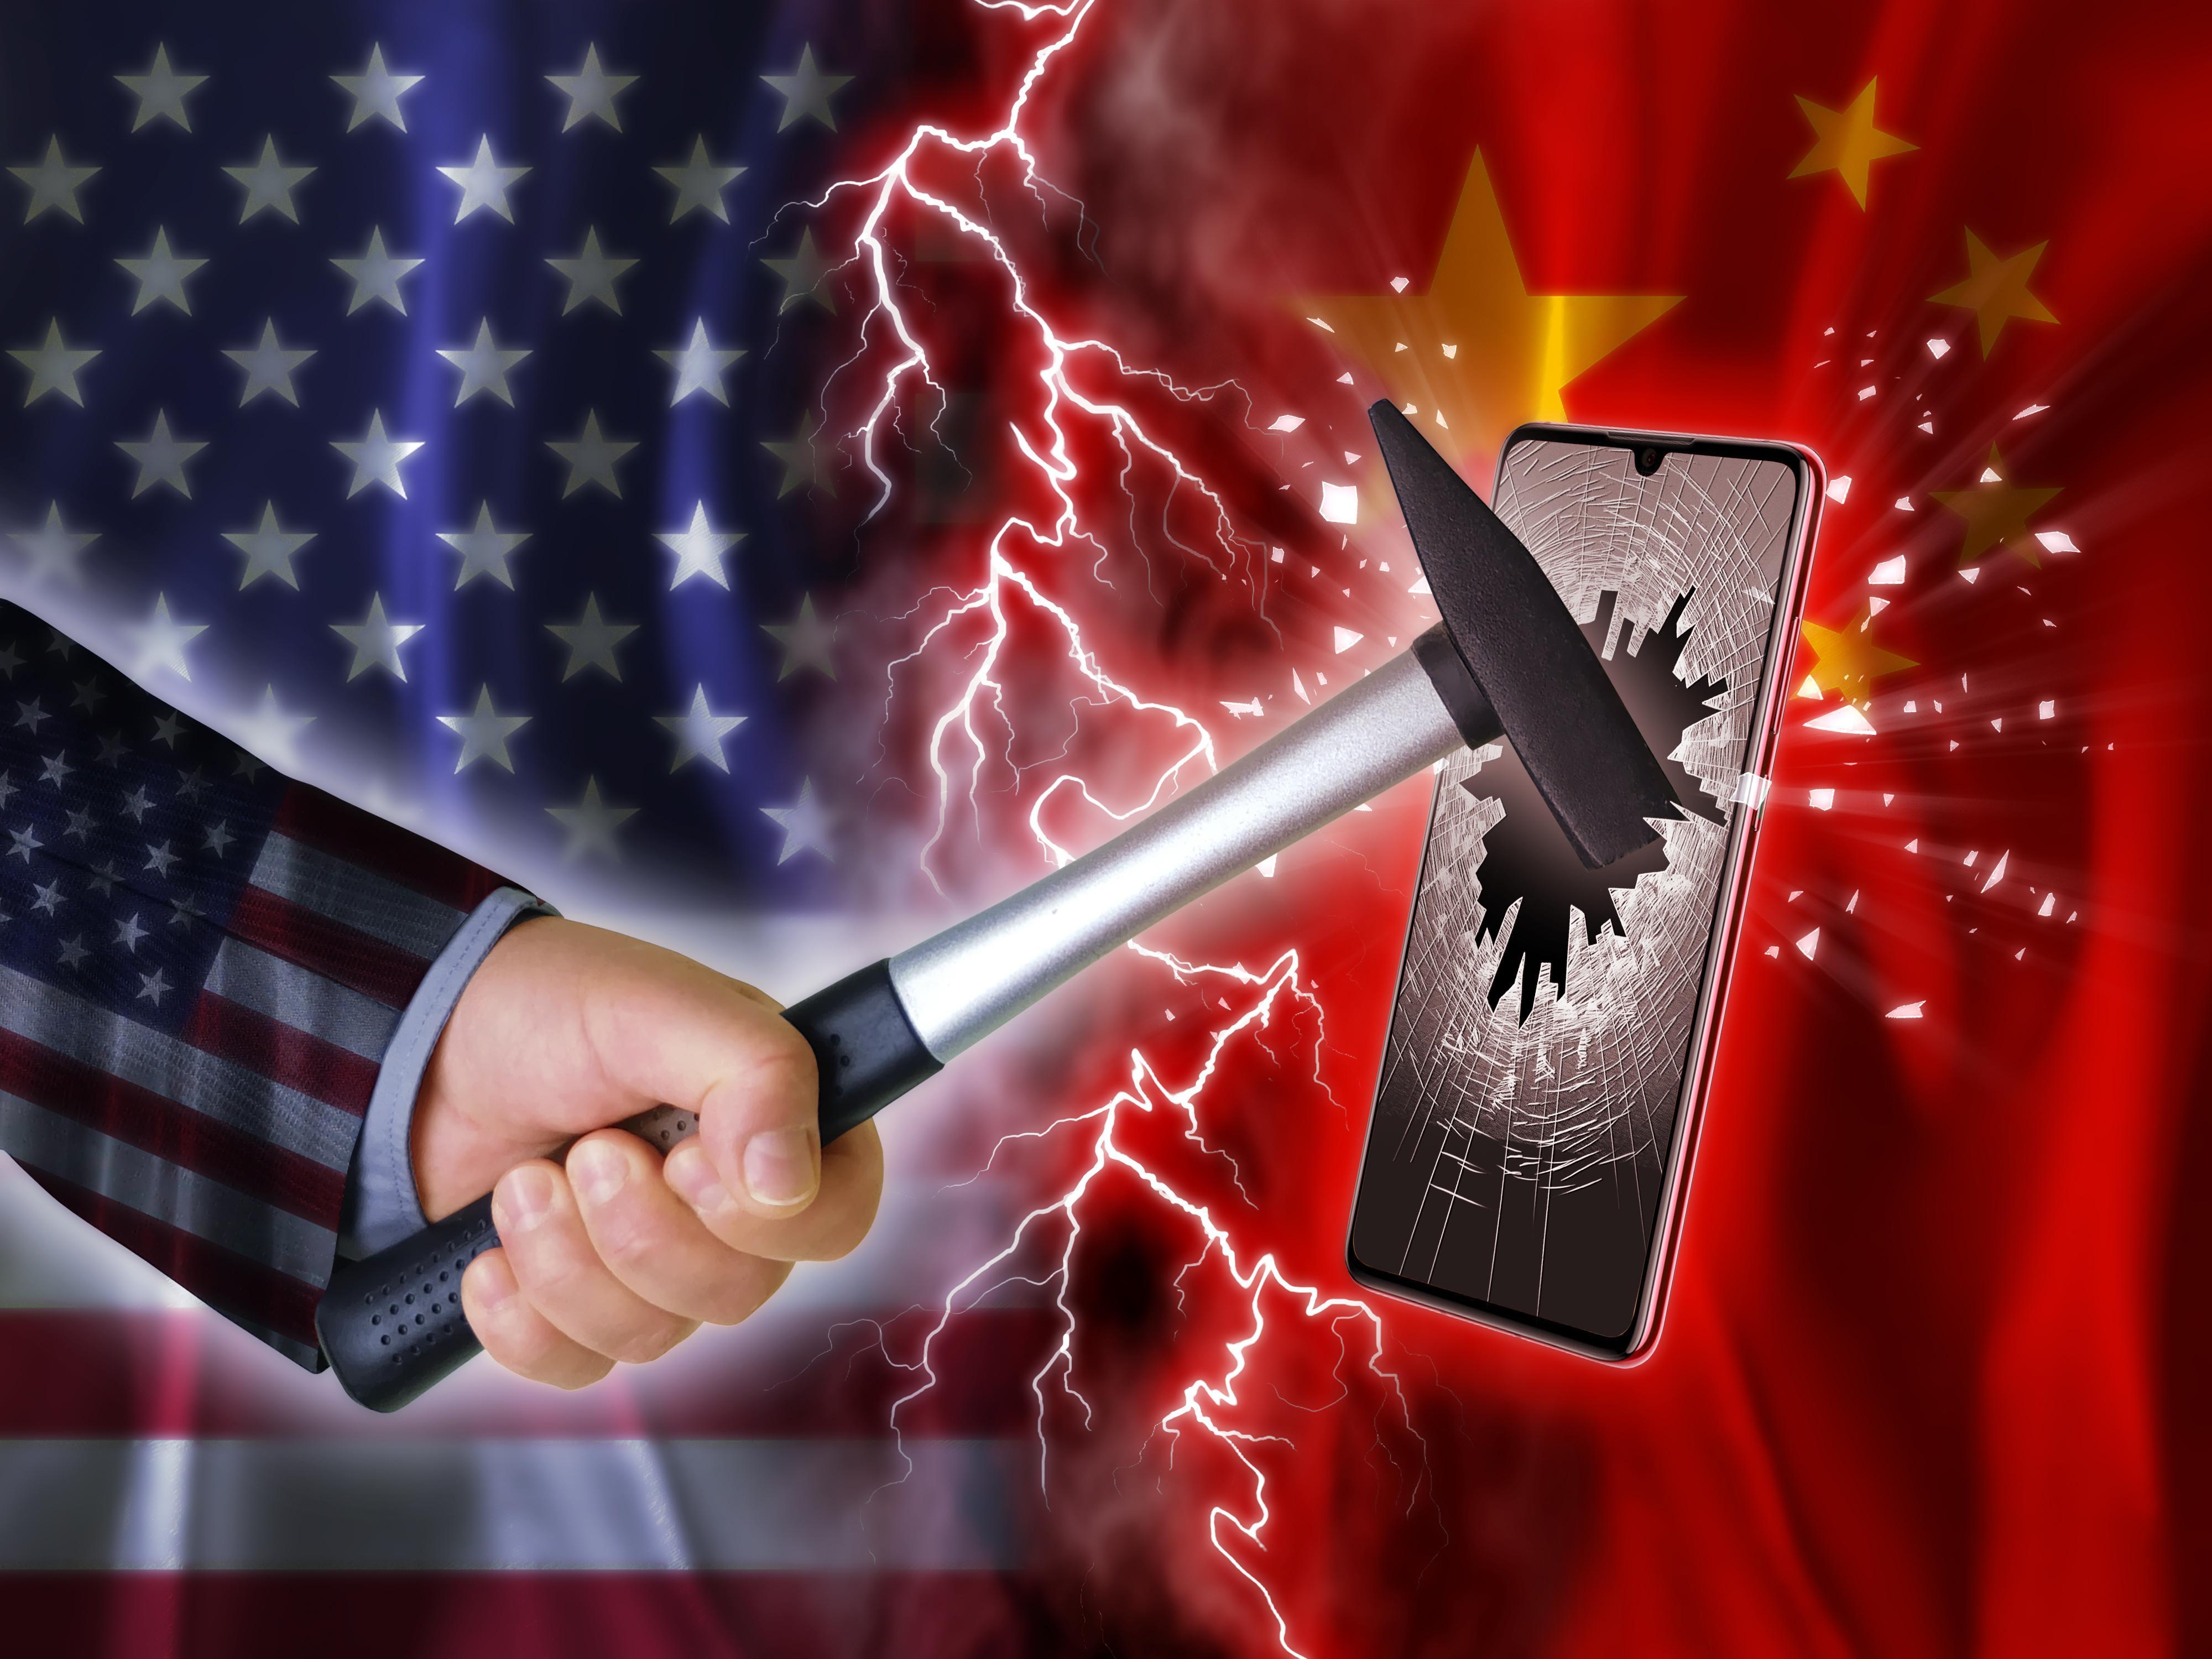 uploads///US ban on Chinas Huawei eased